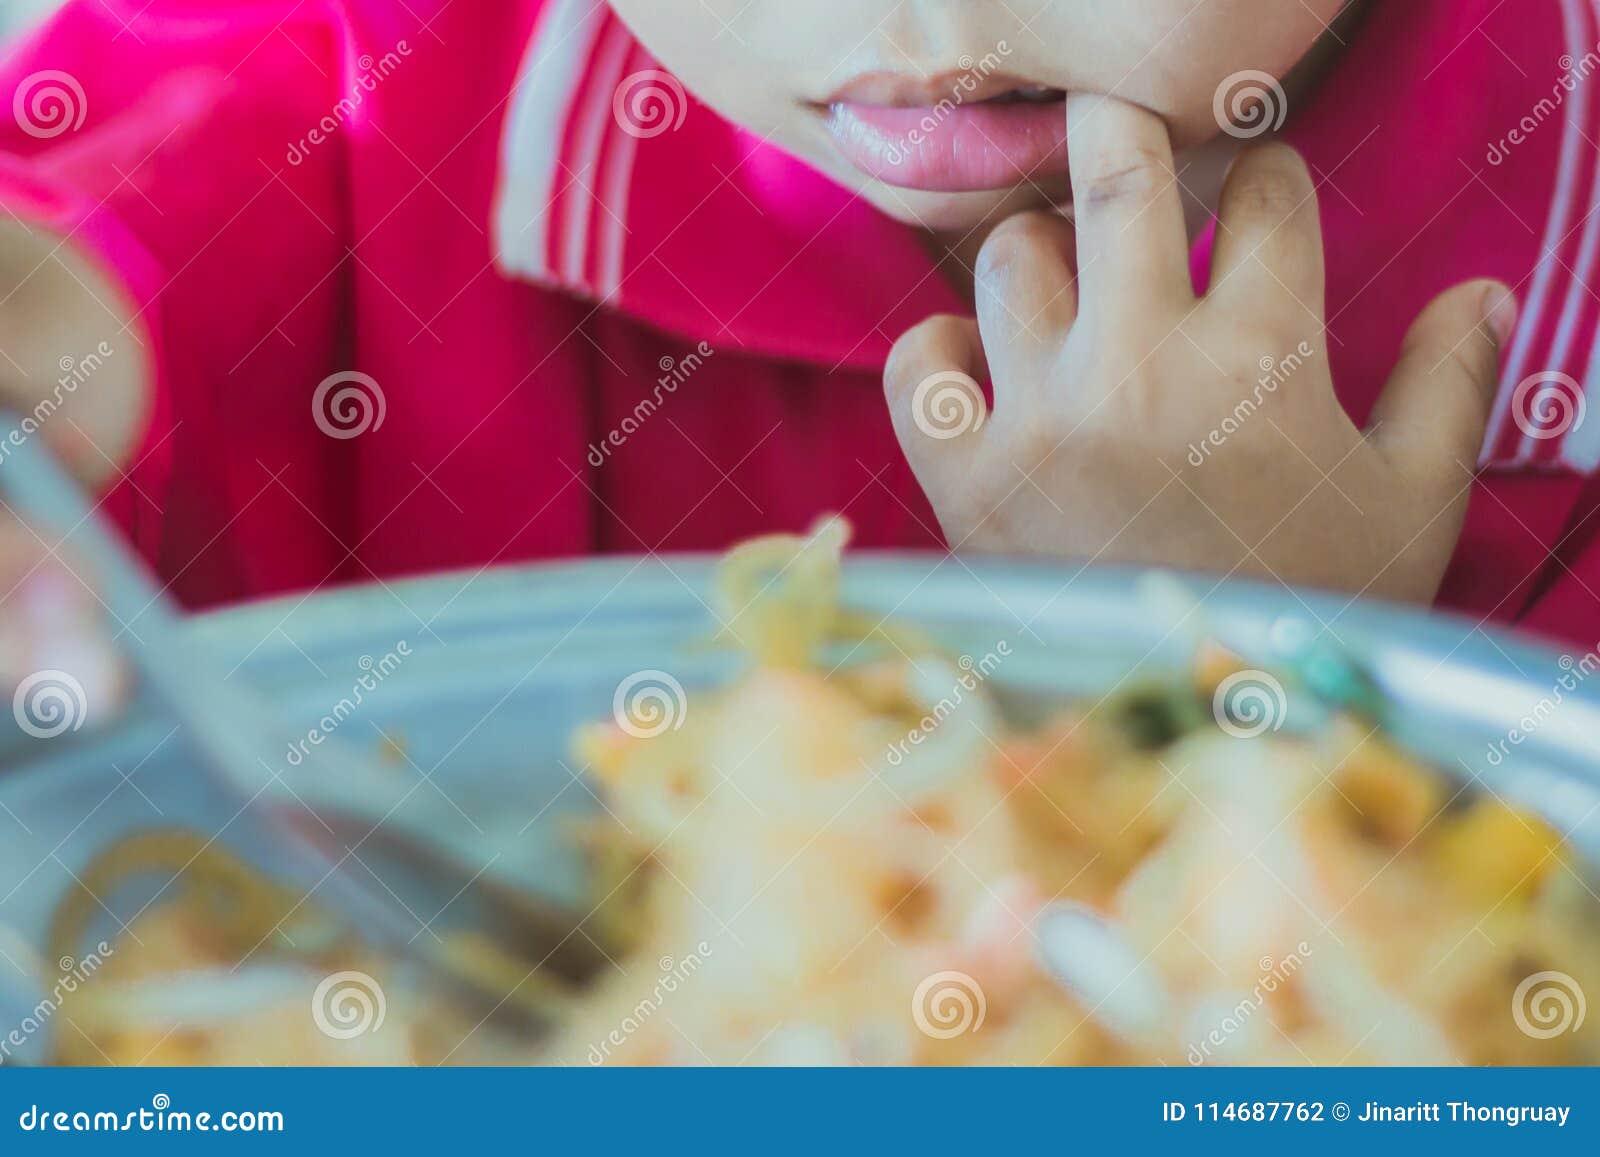 Kindergarten student is eating Pad Thai